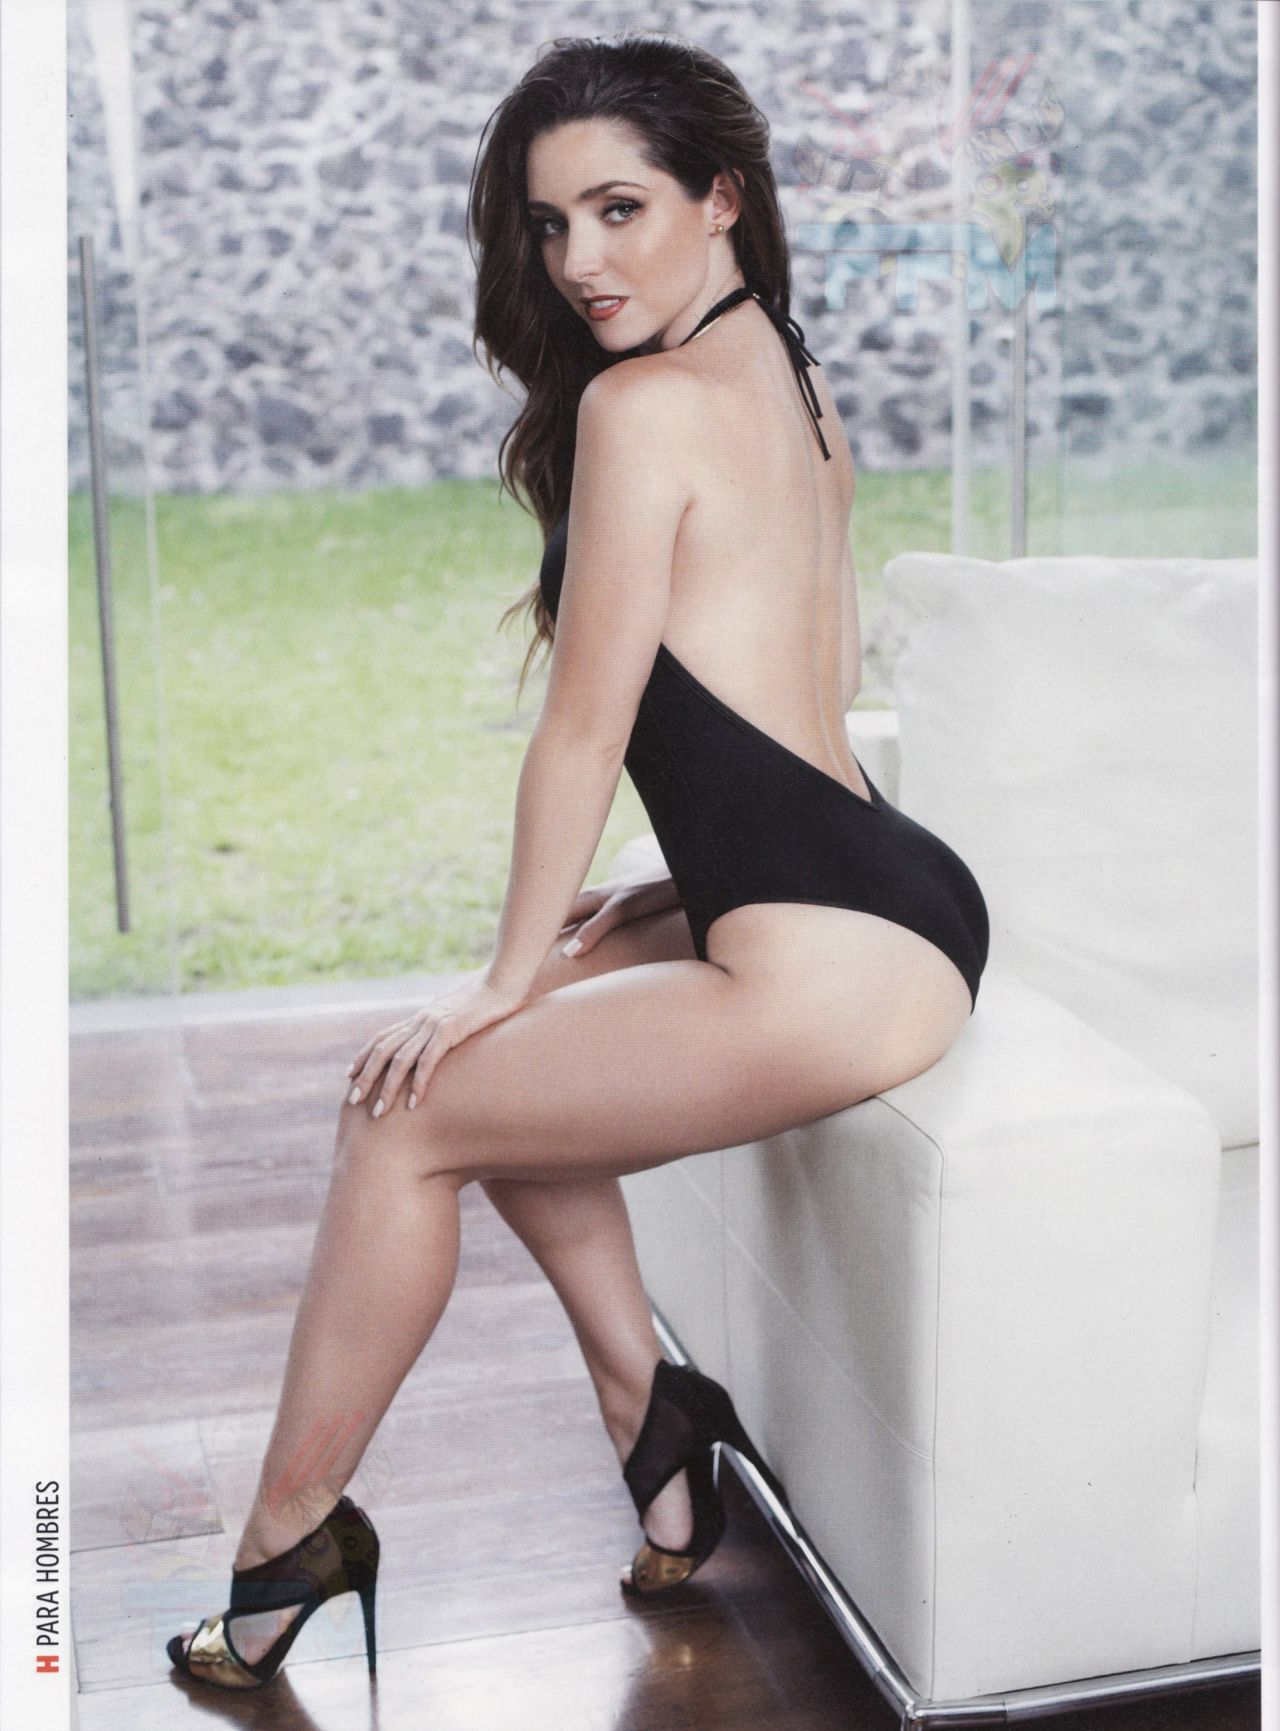 Ariadne Díaz - H PARA HOMBRE Magazine (Mexico) - January 2014 Issue